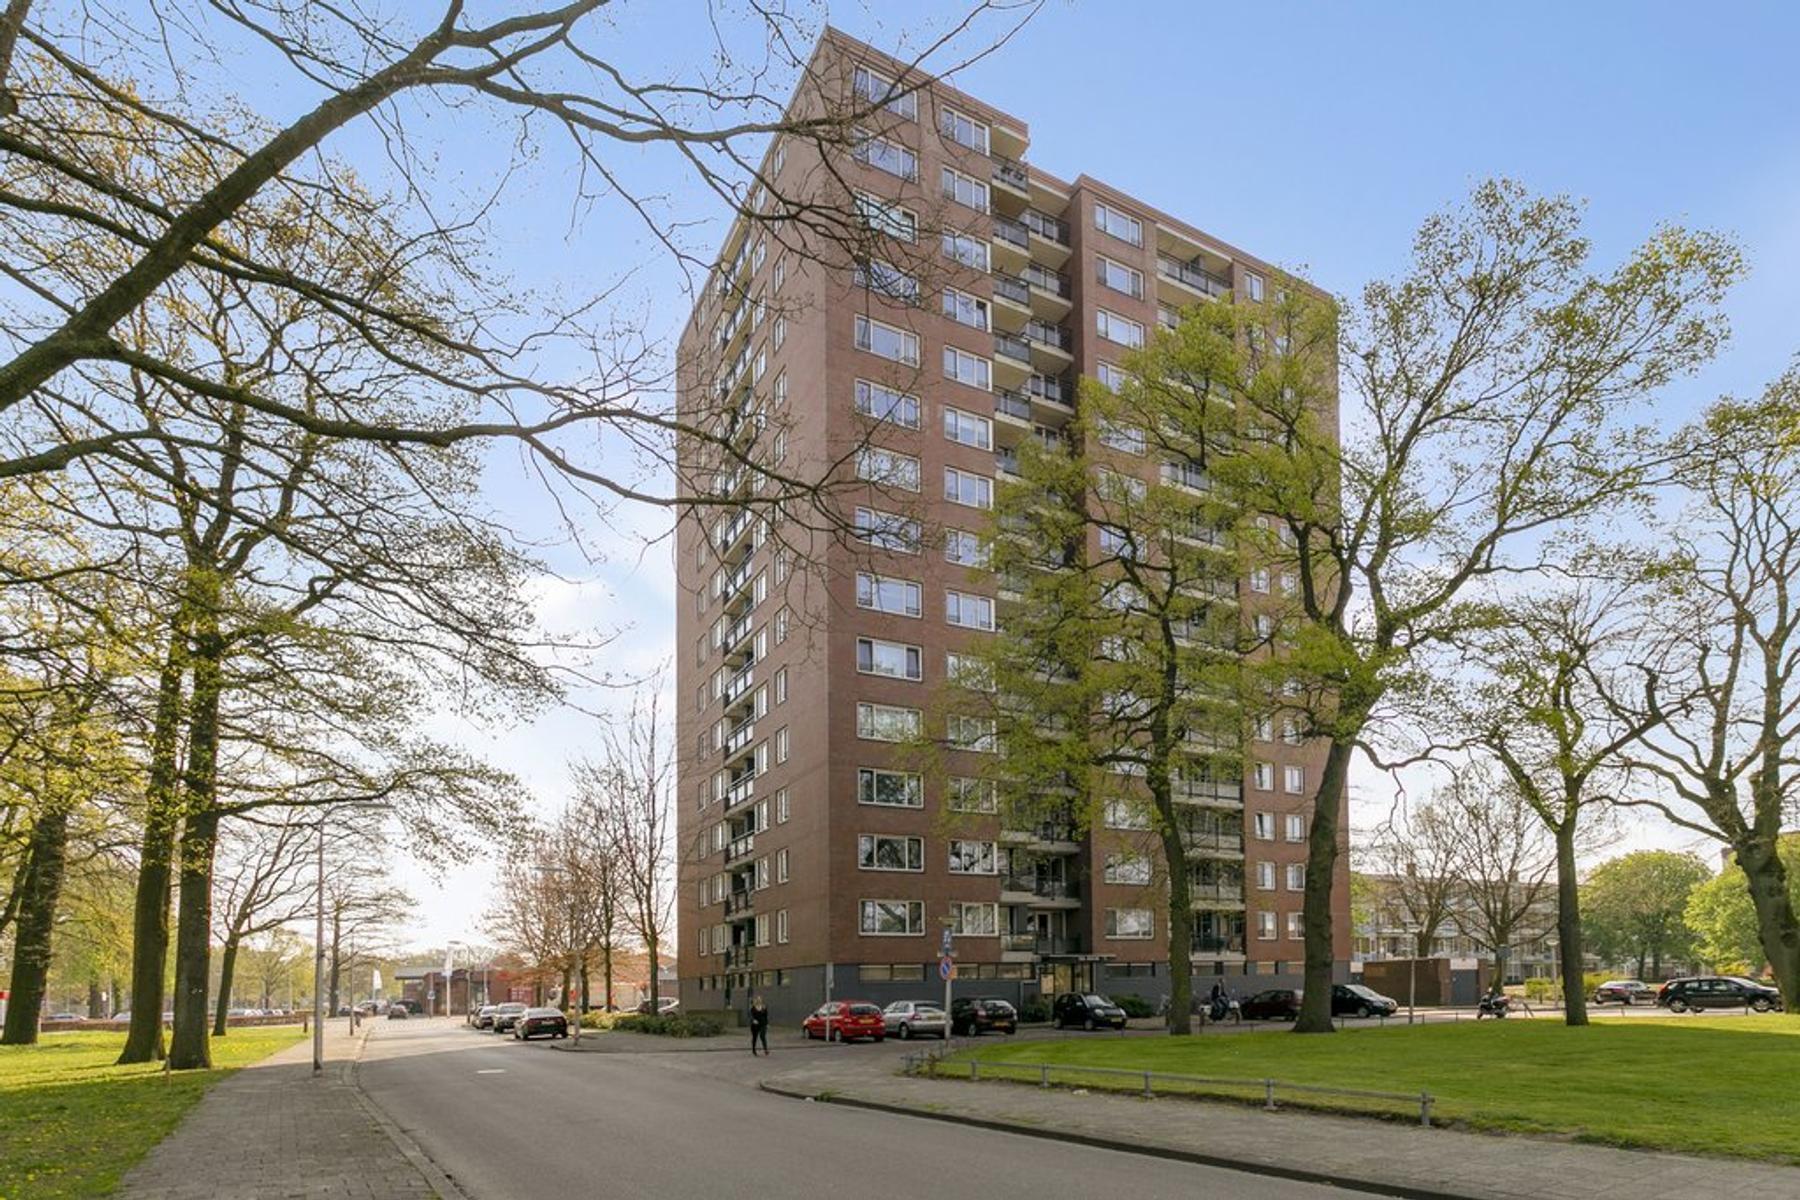 Jekerstraat 220 in Enschede 7523 VV